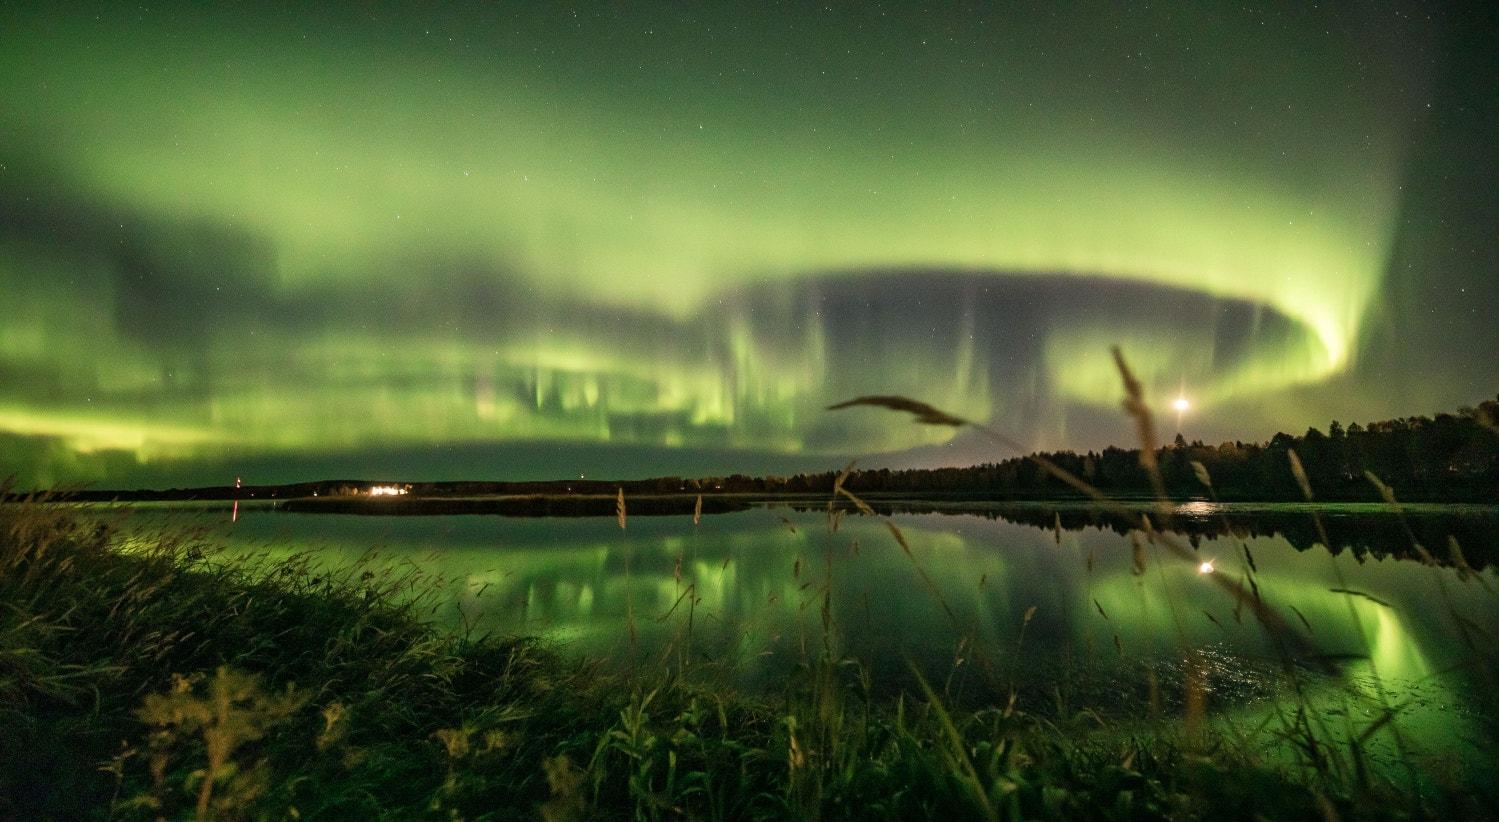 Finlândia, o céu de Rovaniemi em setembro | Alexander Kuznetsov - Reuters